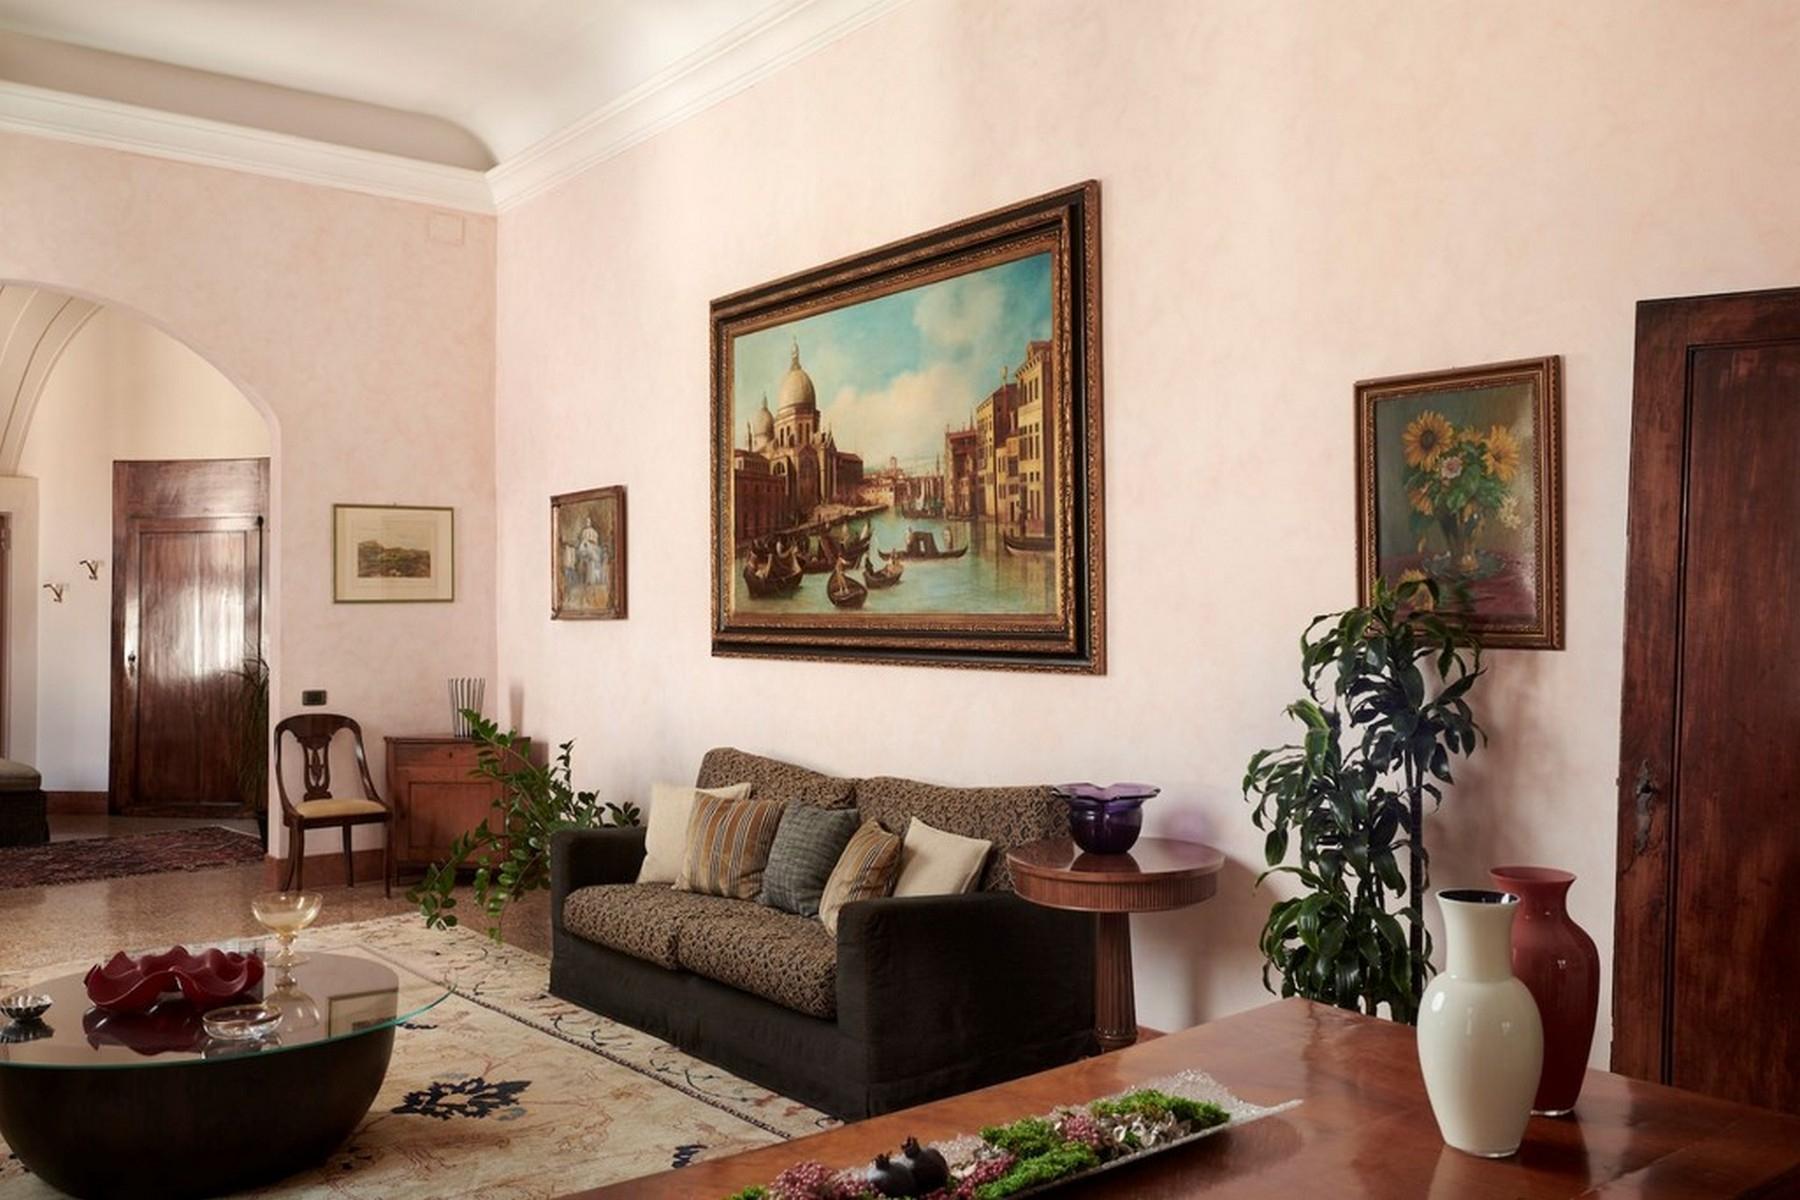 Elegante secondo Piano Nobile in un Palazzo - 4